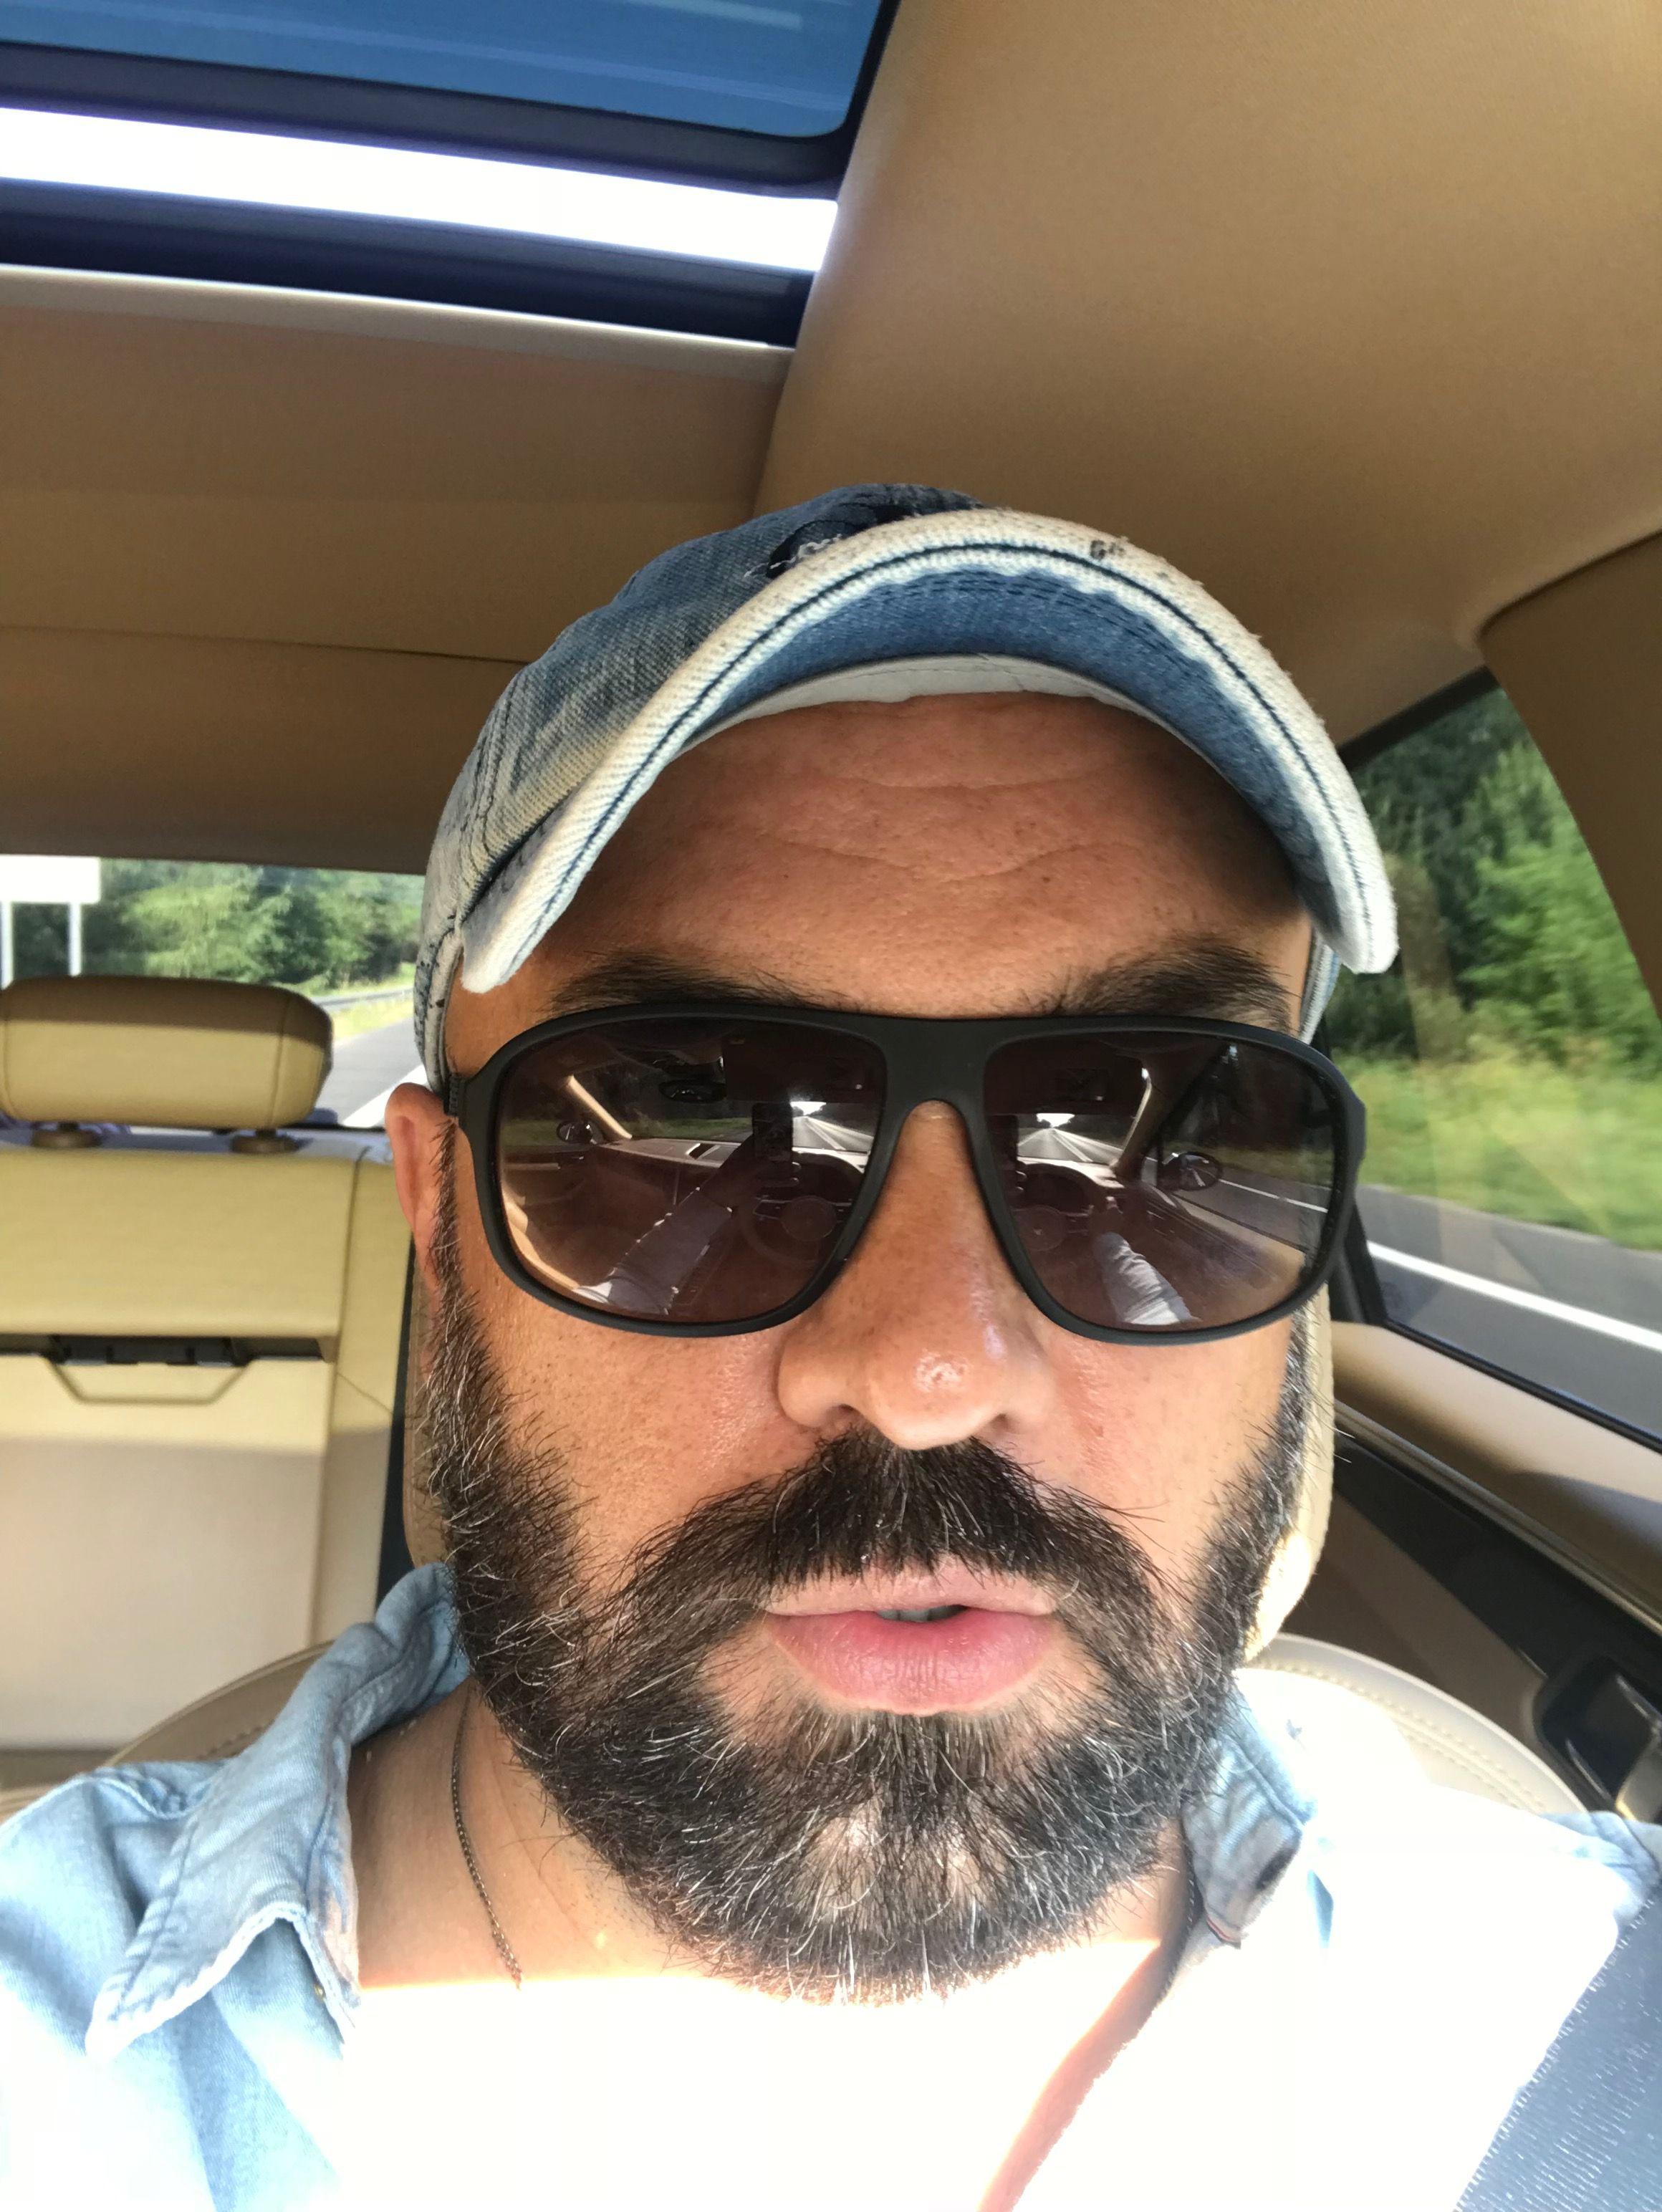 Pin By Gpiasny On Beard Beard Ball Cap Trucker Hat